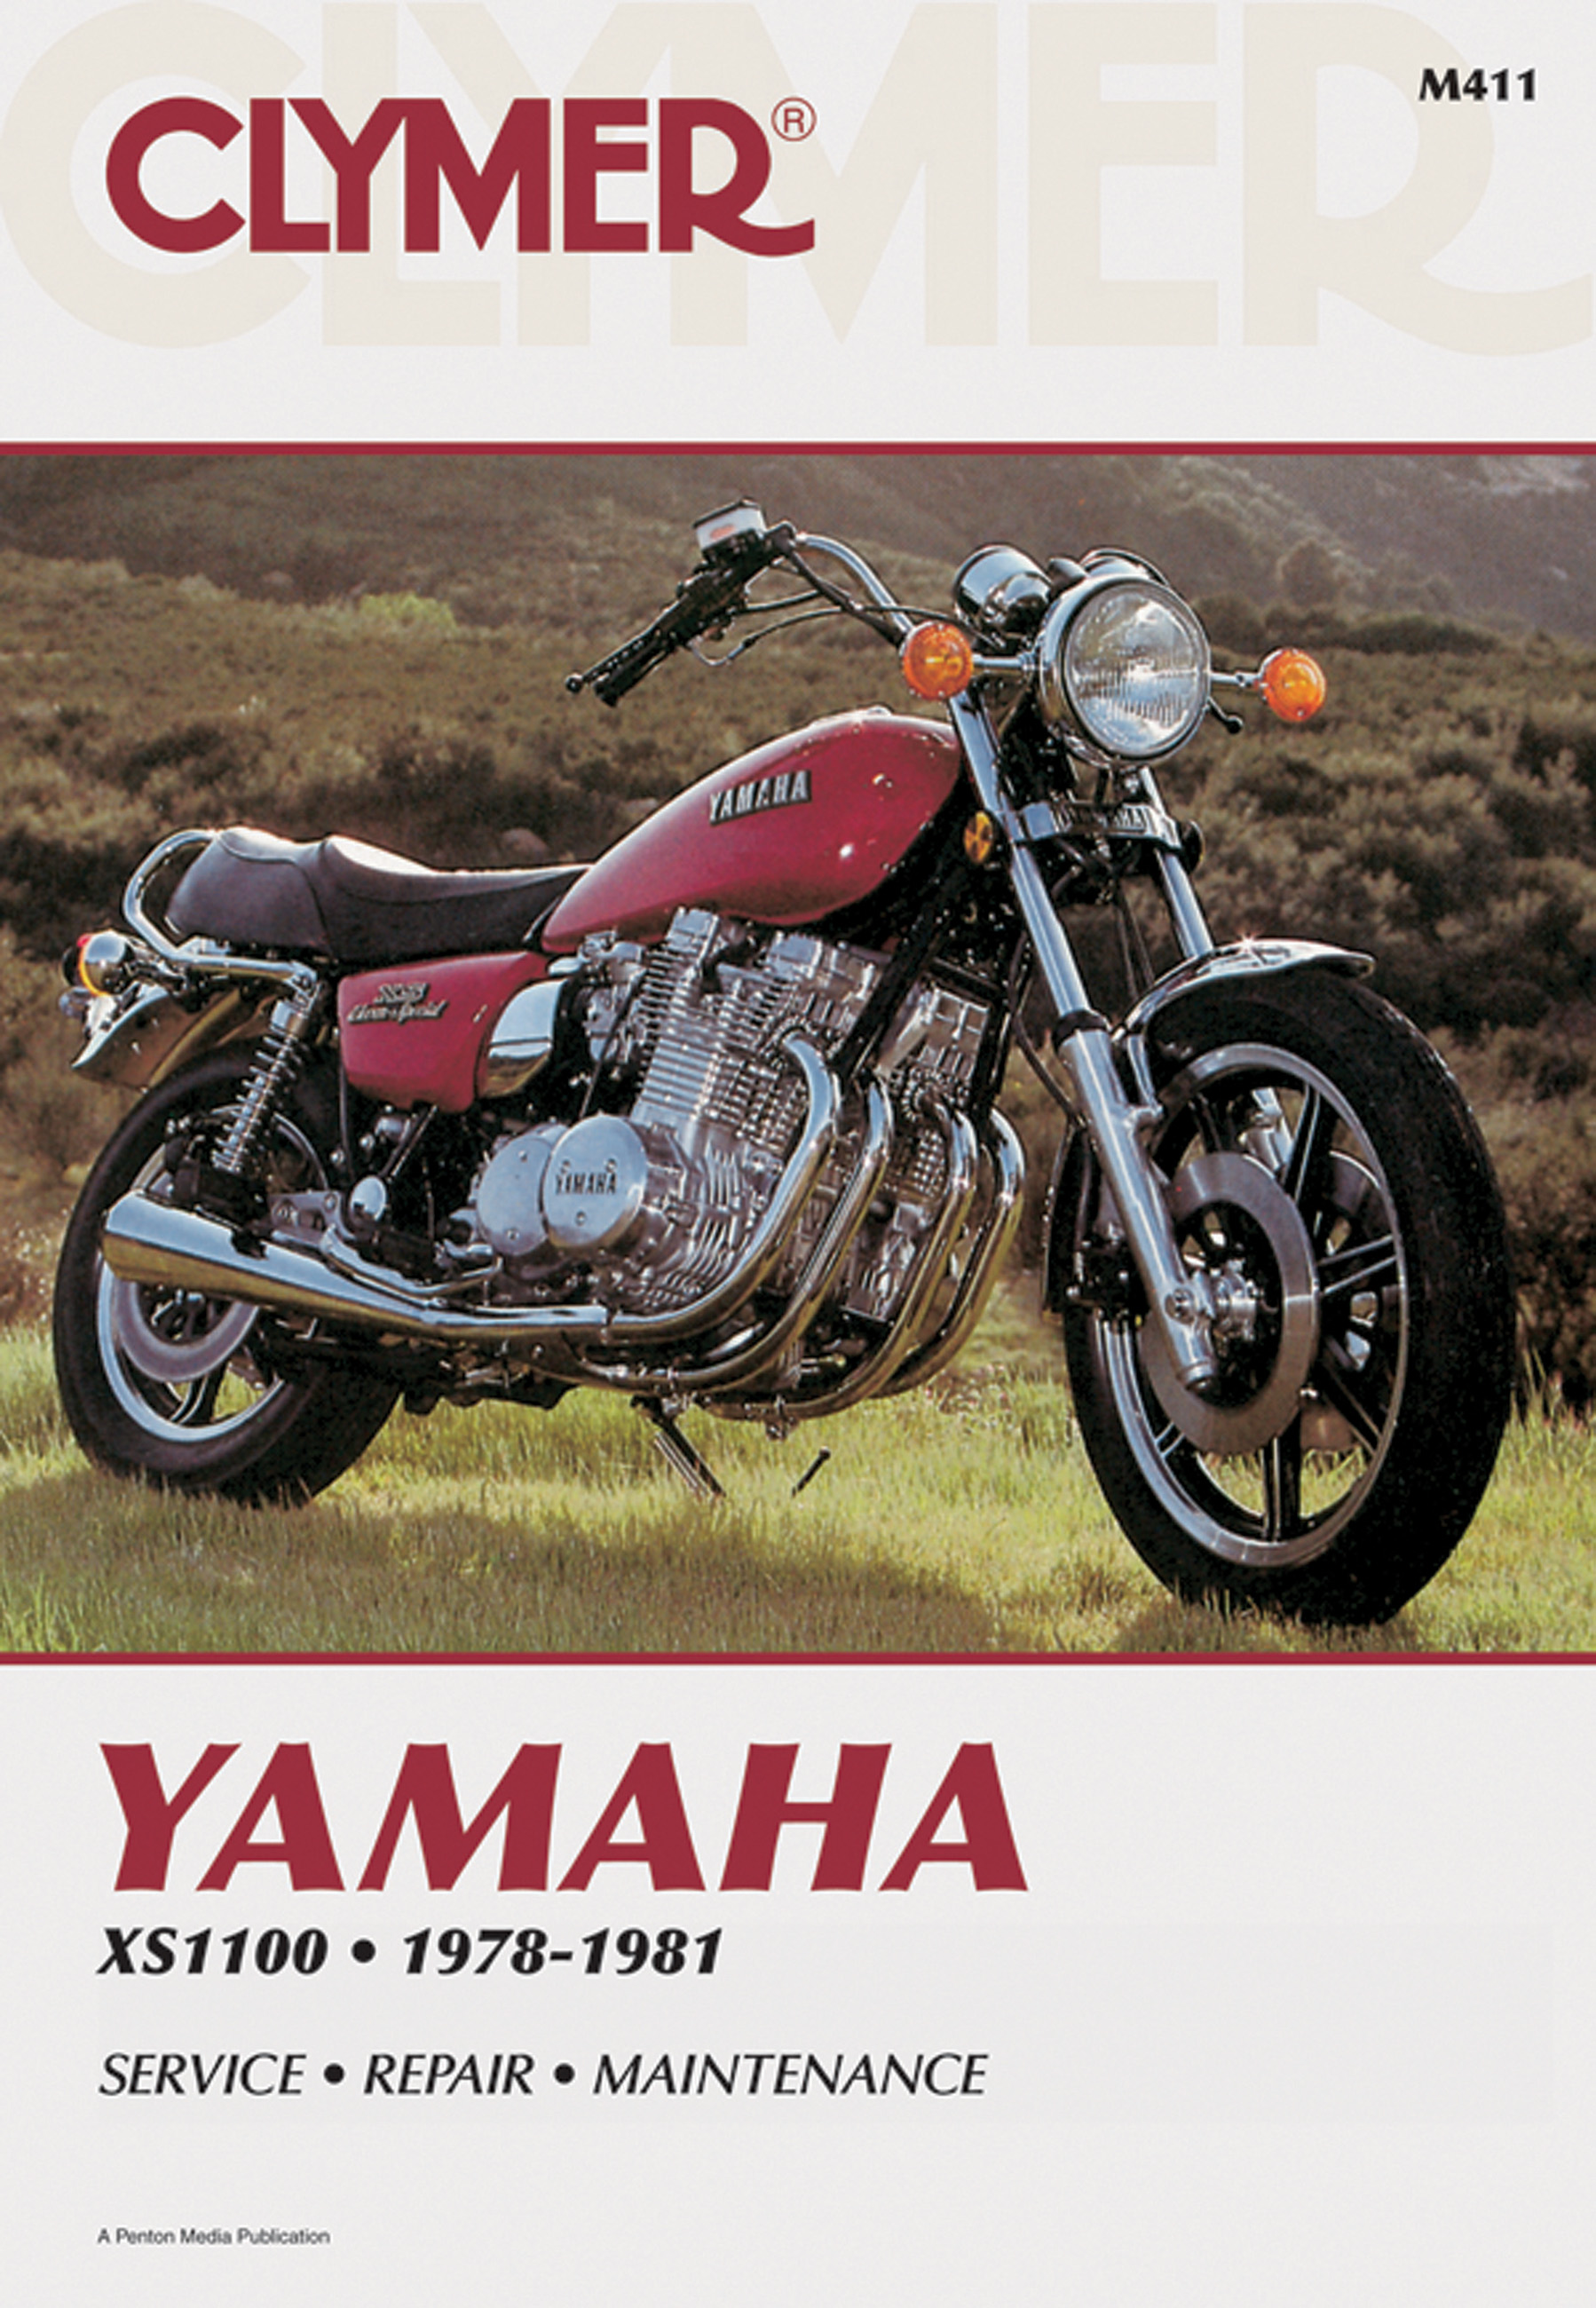 Sentinel YAMAHA XS1100 FOURS SERVICE REPAIR SHOP MANUAL BOOK CLYMER HAYNES  1978-81